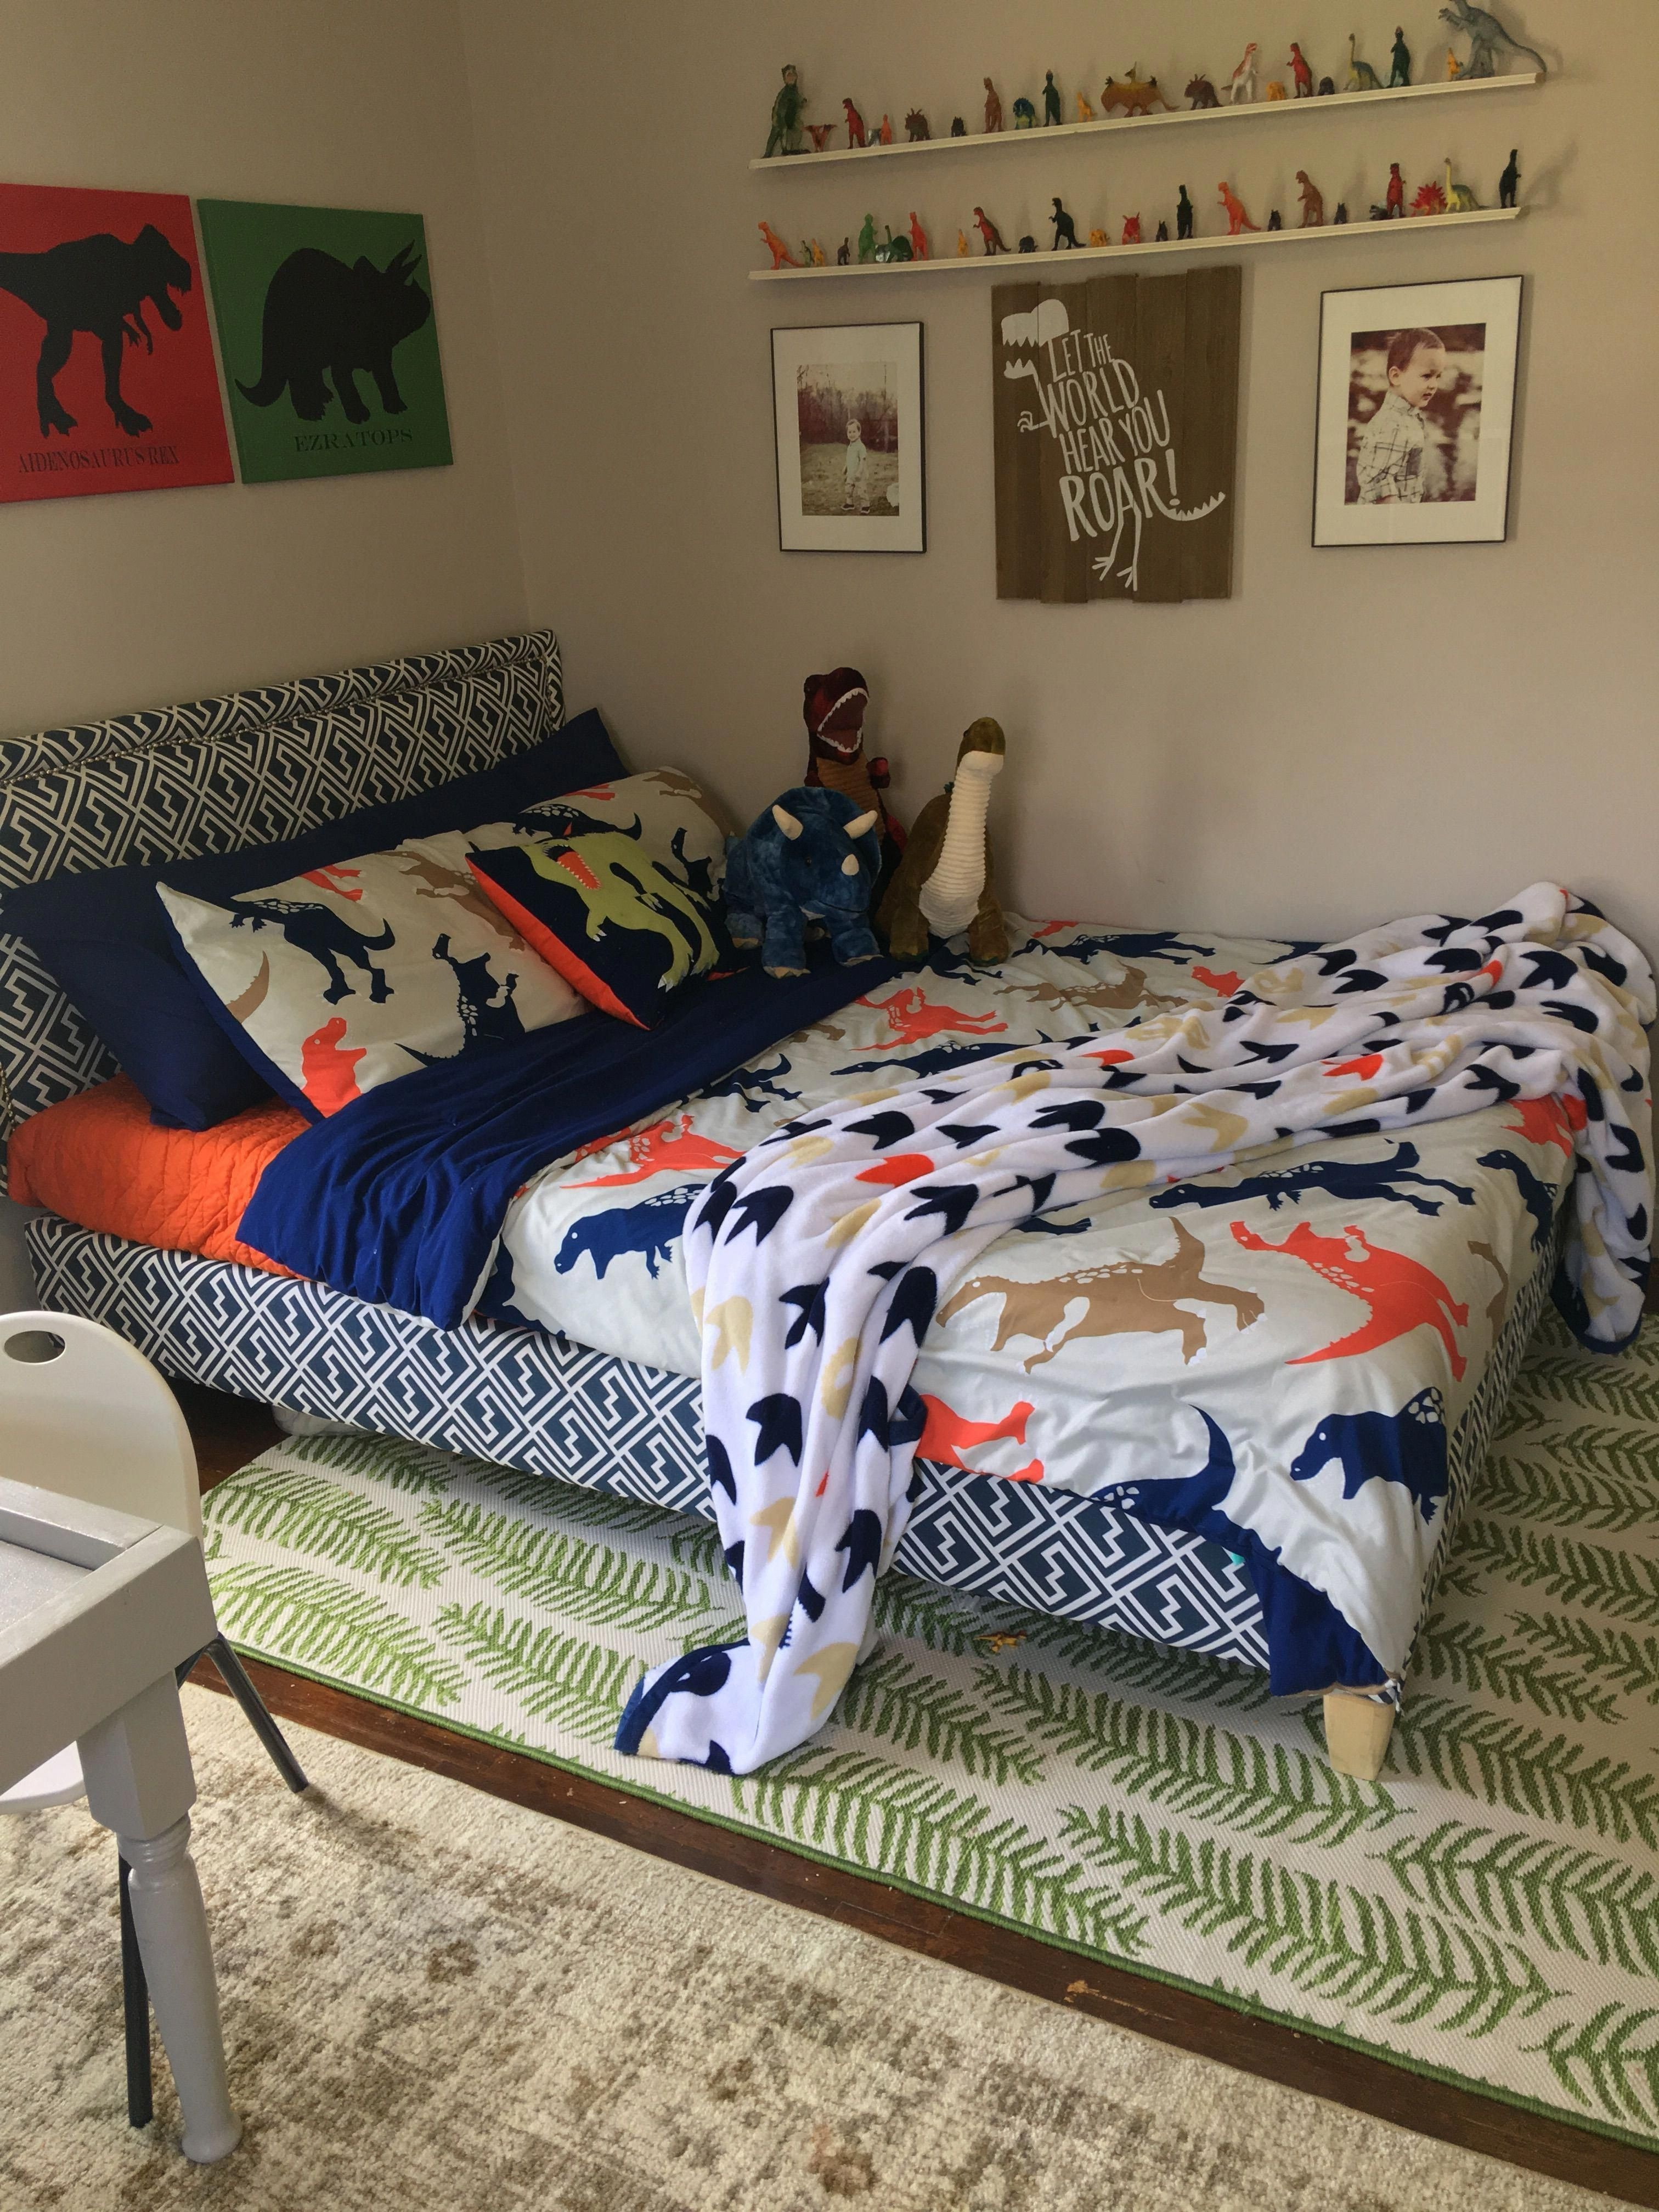 Little Boy Bedroom Set Lovely Bed Linen 1000 Thread Count Fashionablebeddingideas